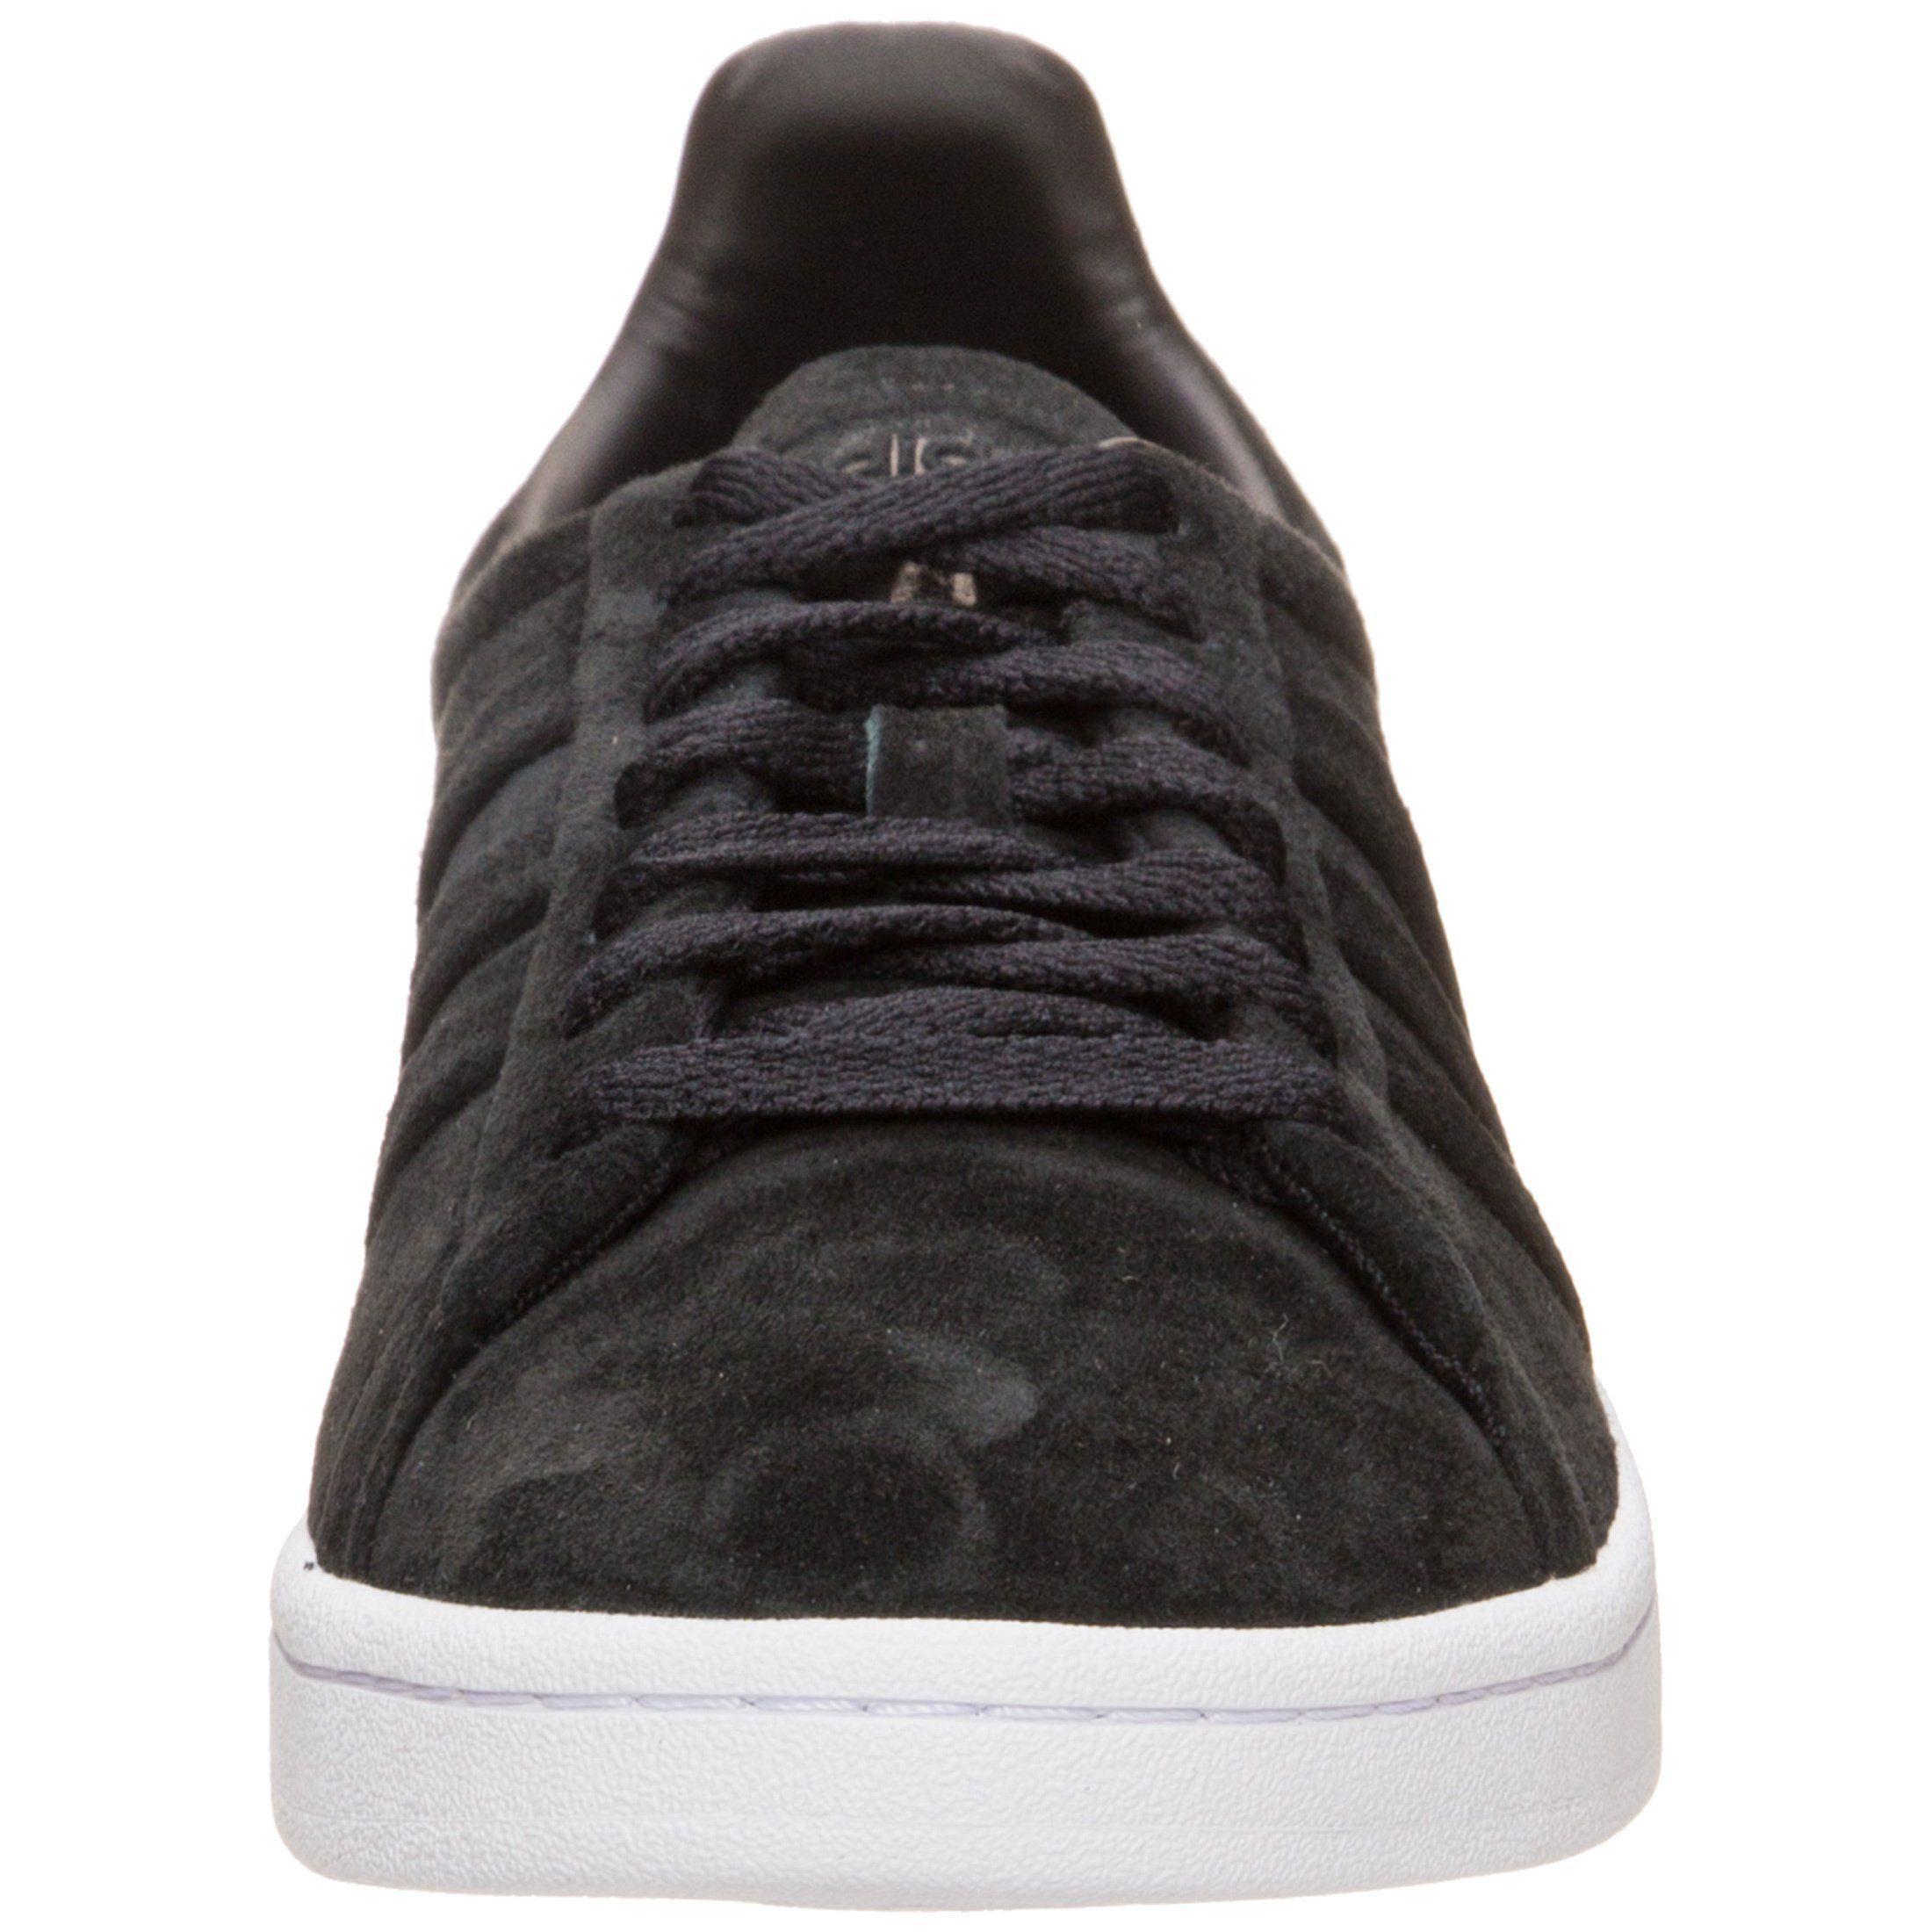 adidas Originals Campus Stitch  And Turn Sneaker  Stitch dunkelrot ad391f